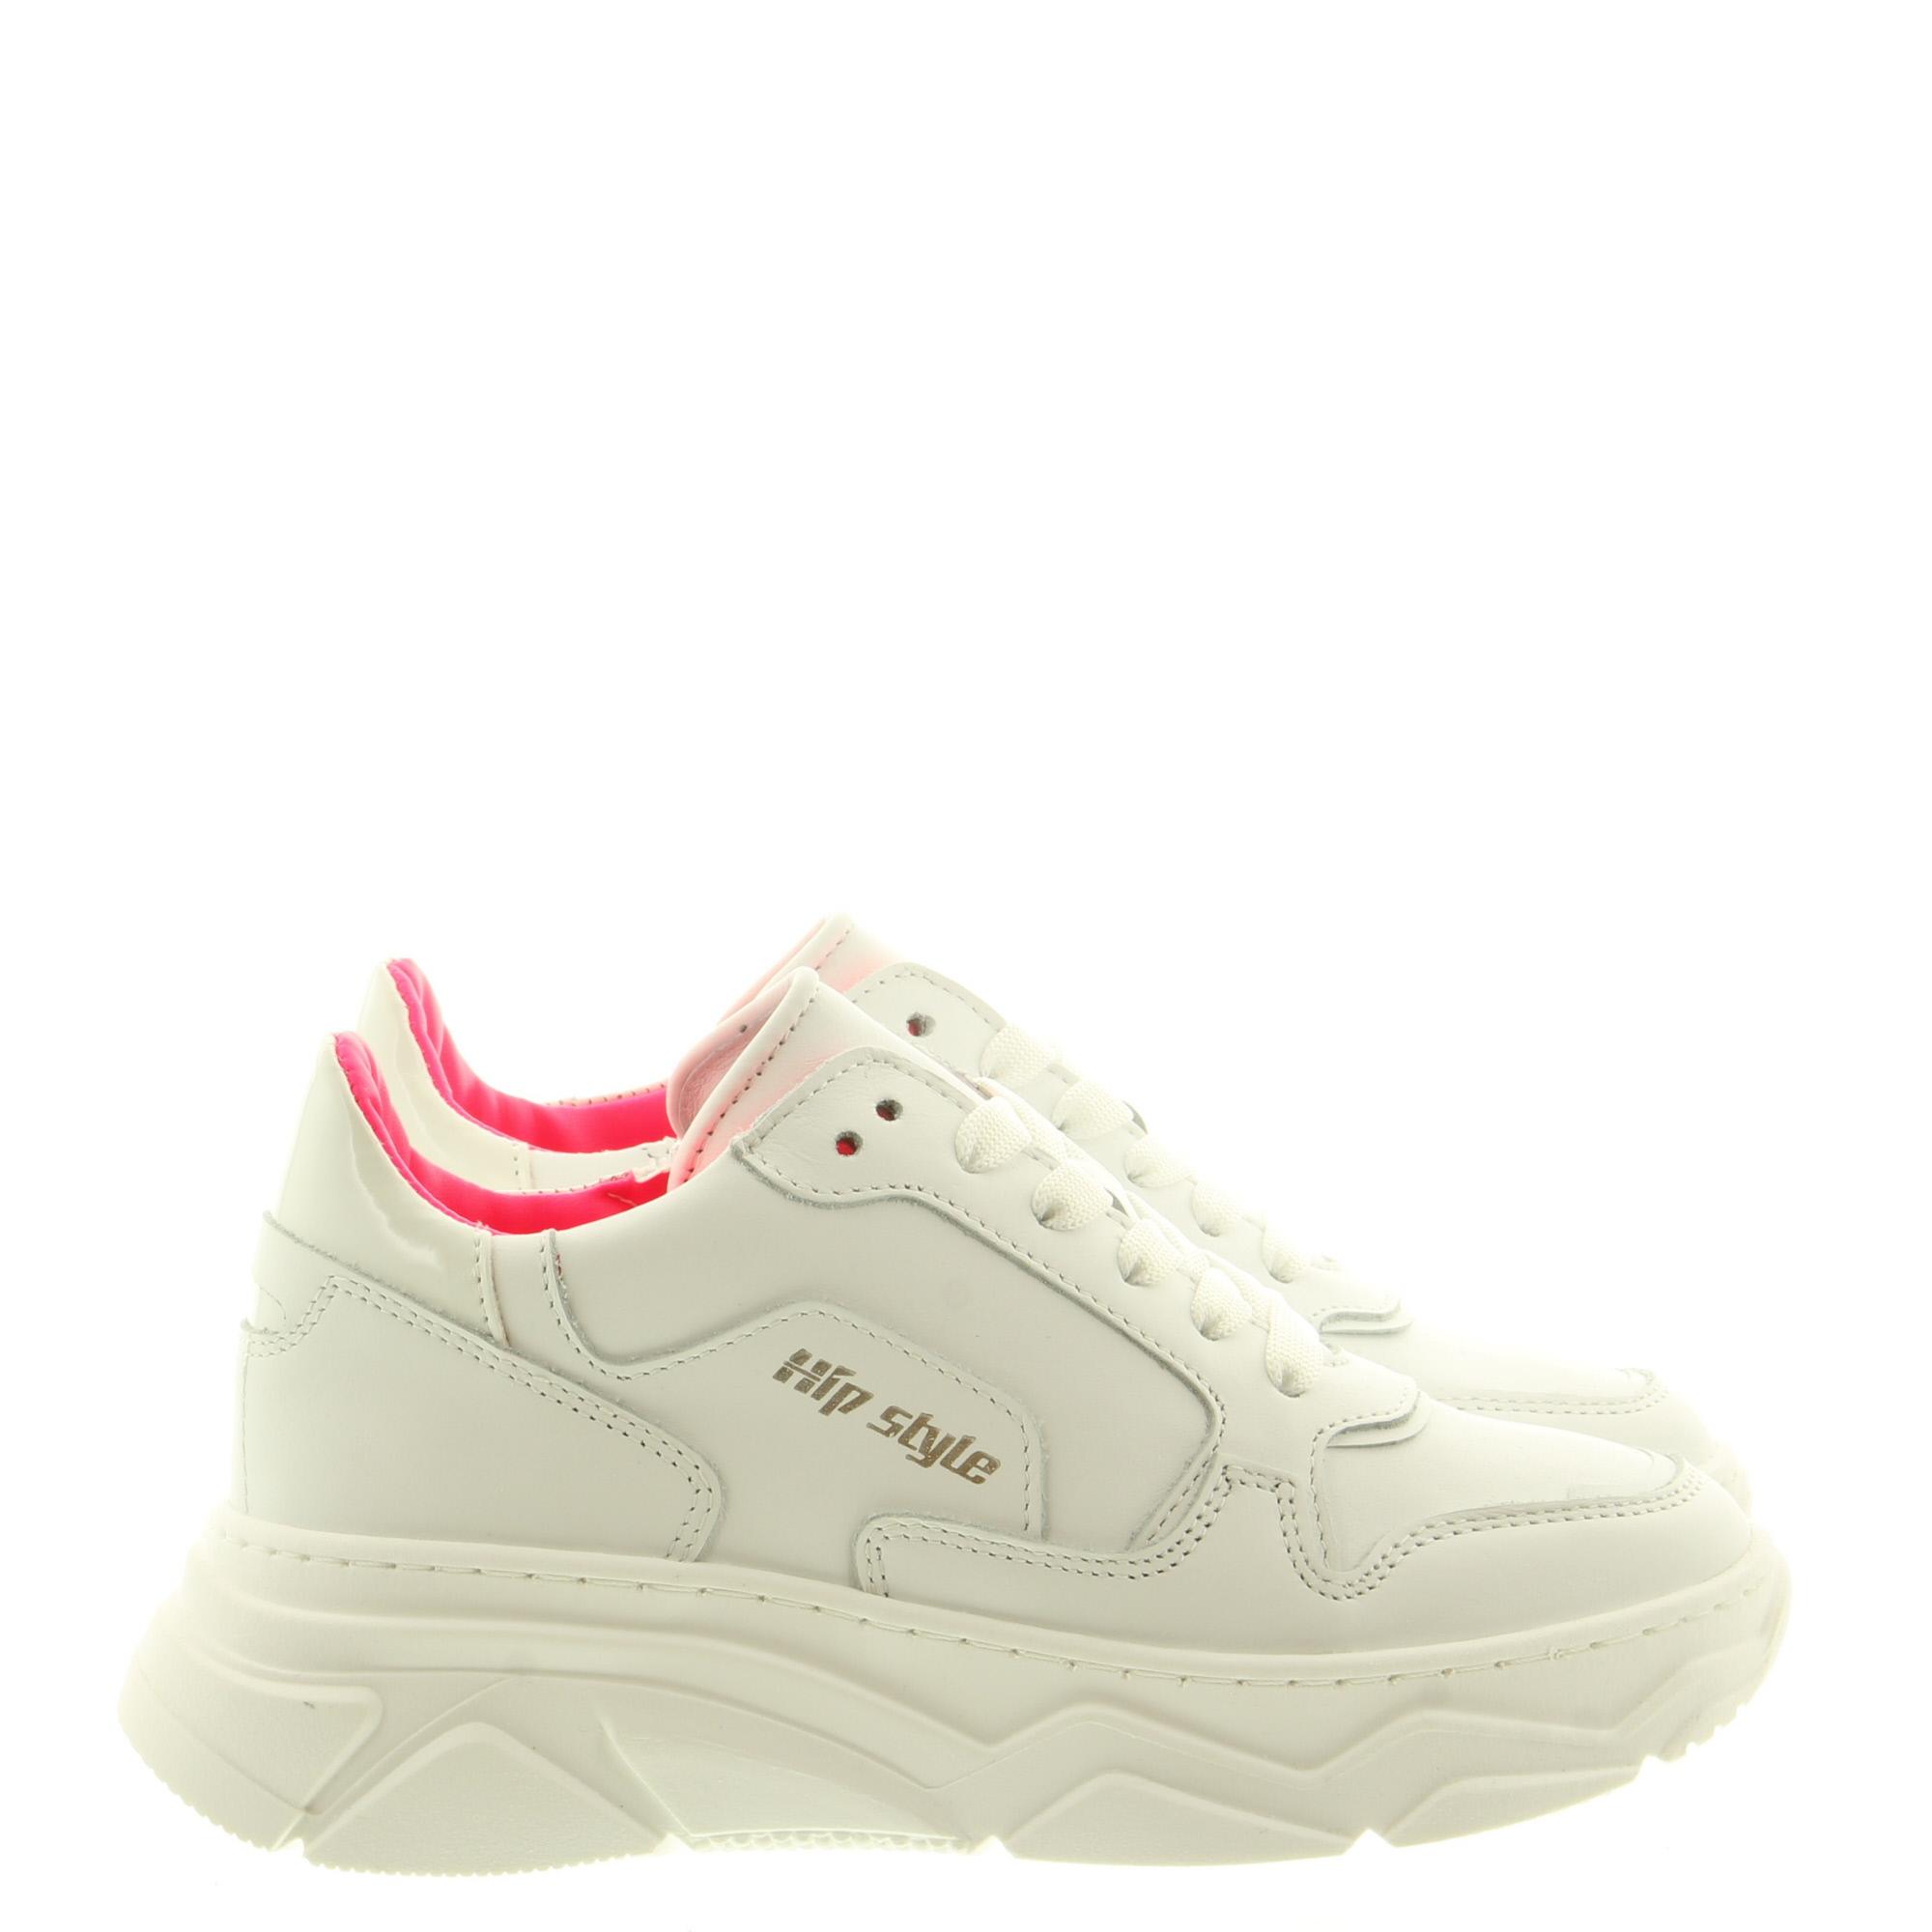 Hip Kids H1762 30CO White